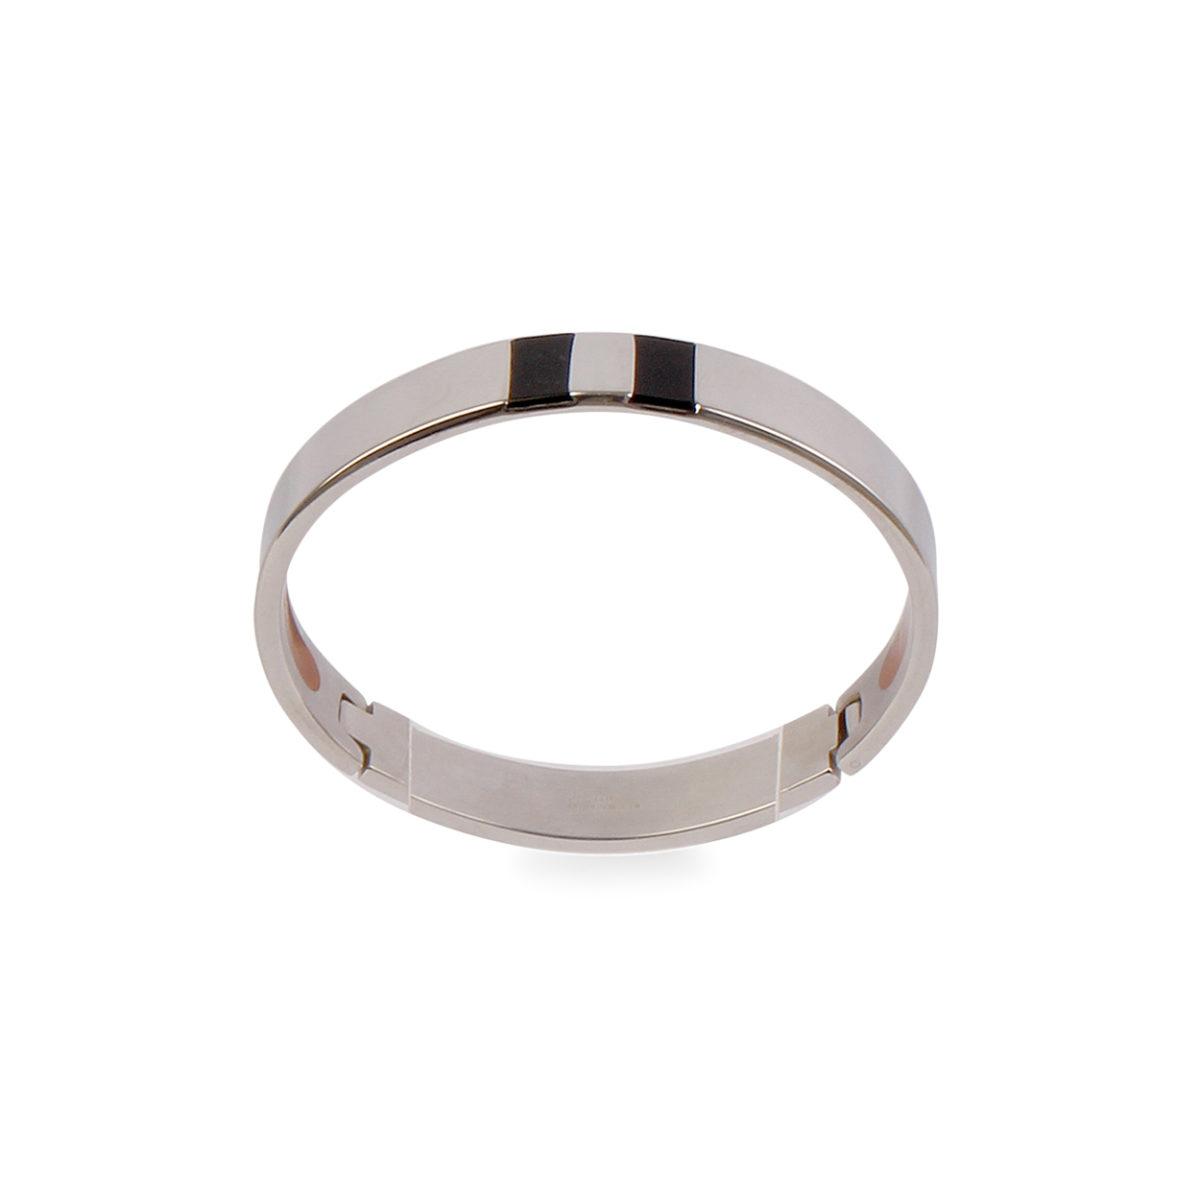 montblanc men 39 s bracelet stainless steel luxity. Black Bedroom Furniture Sets. Home Design Ideas